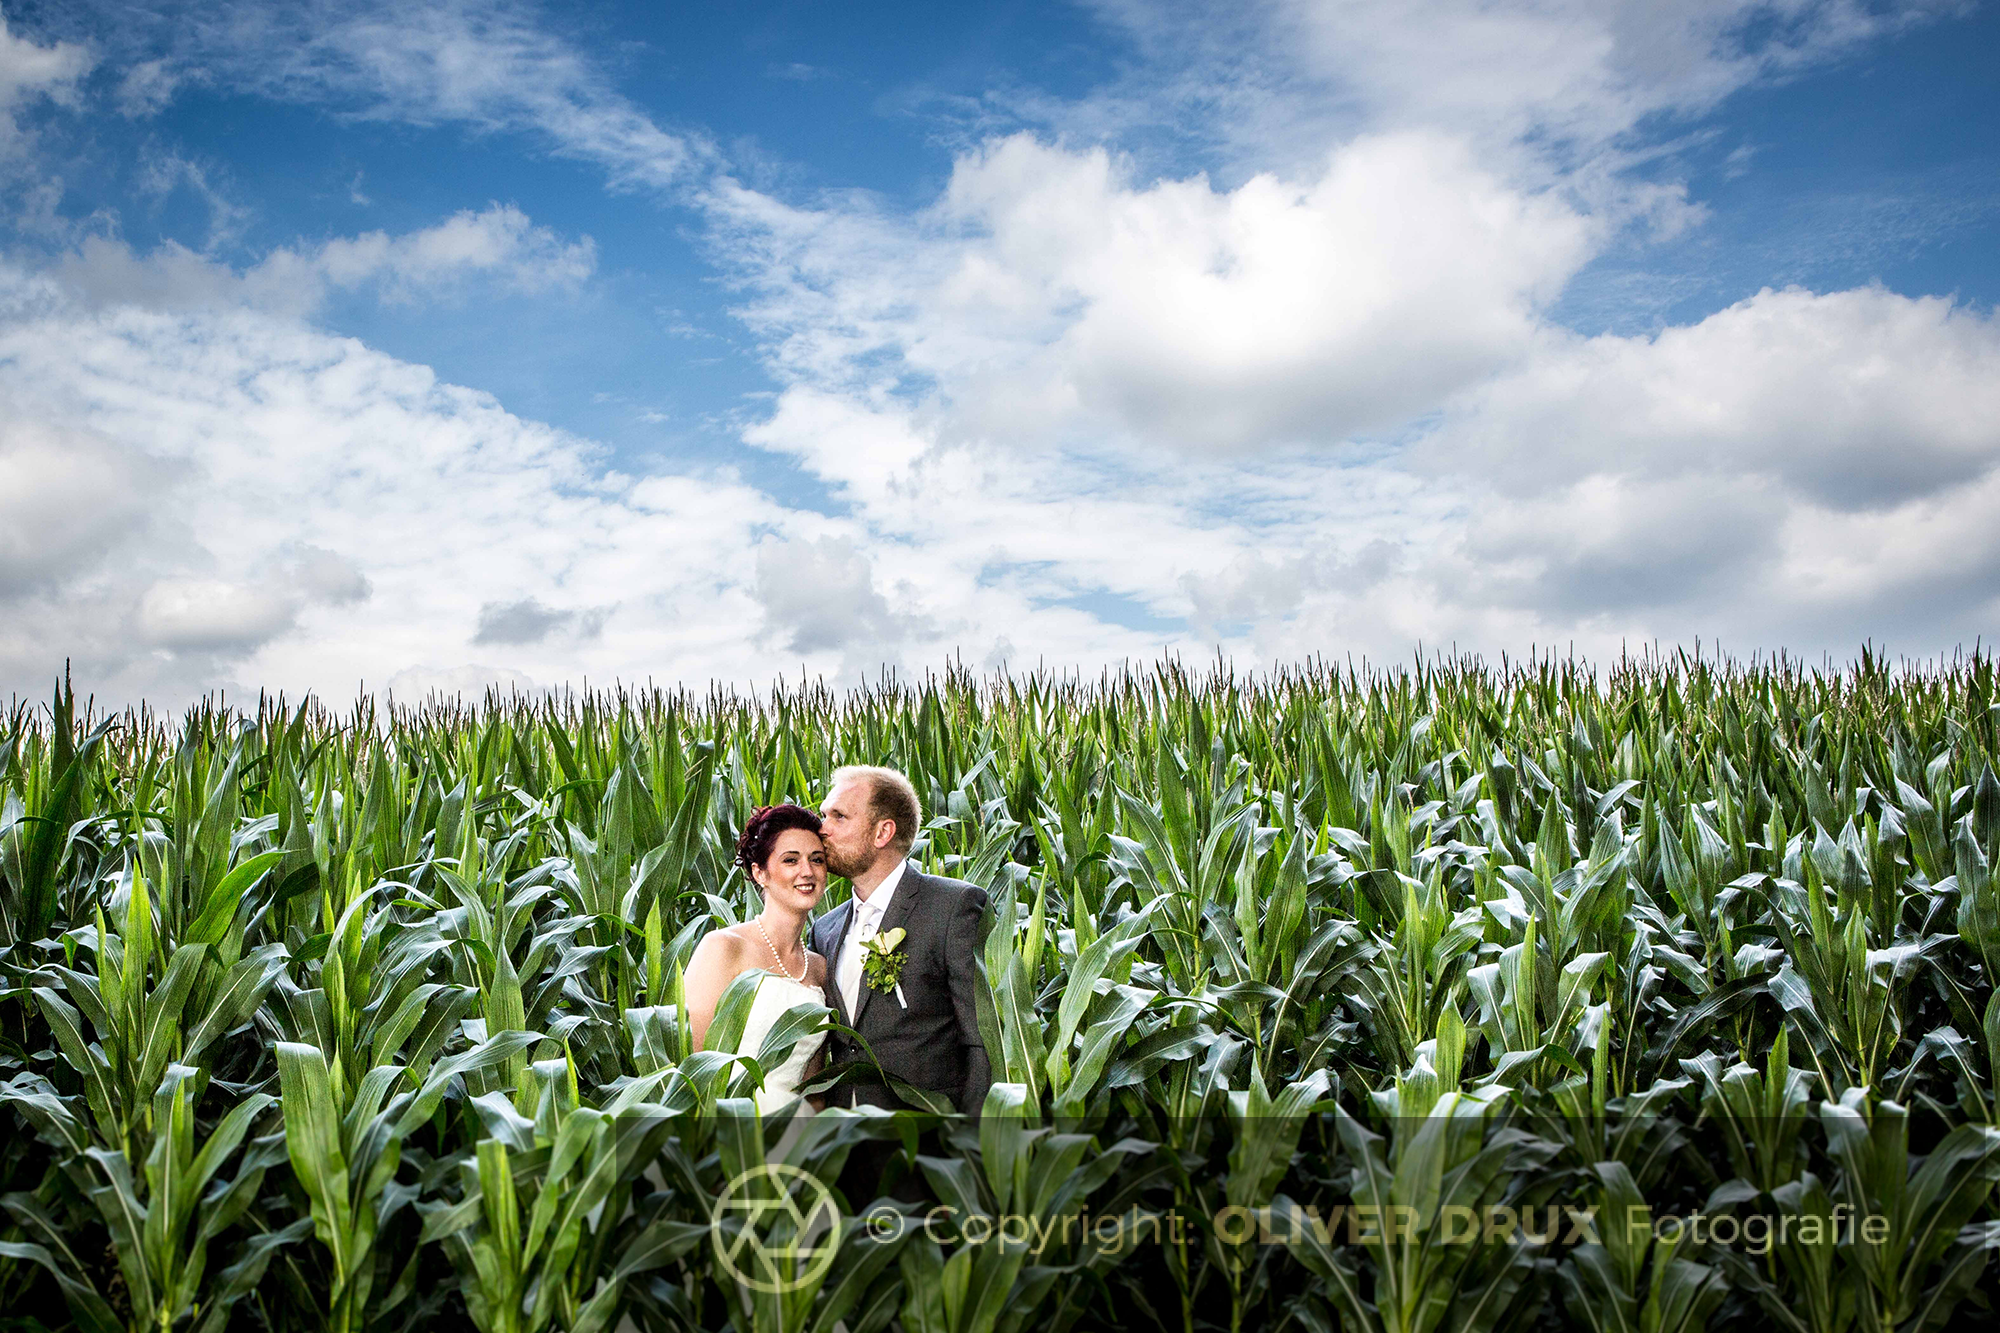 Brautpaarshooting im Maisfeld